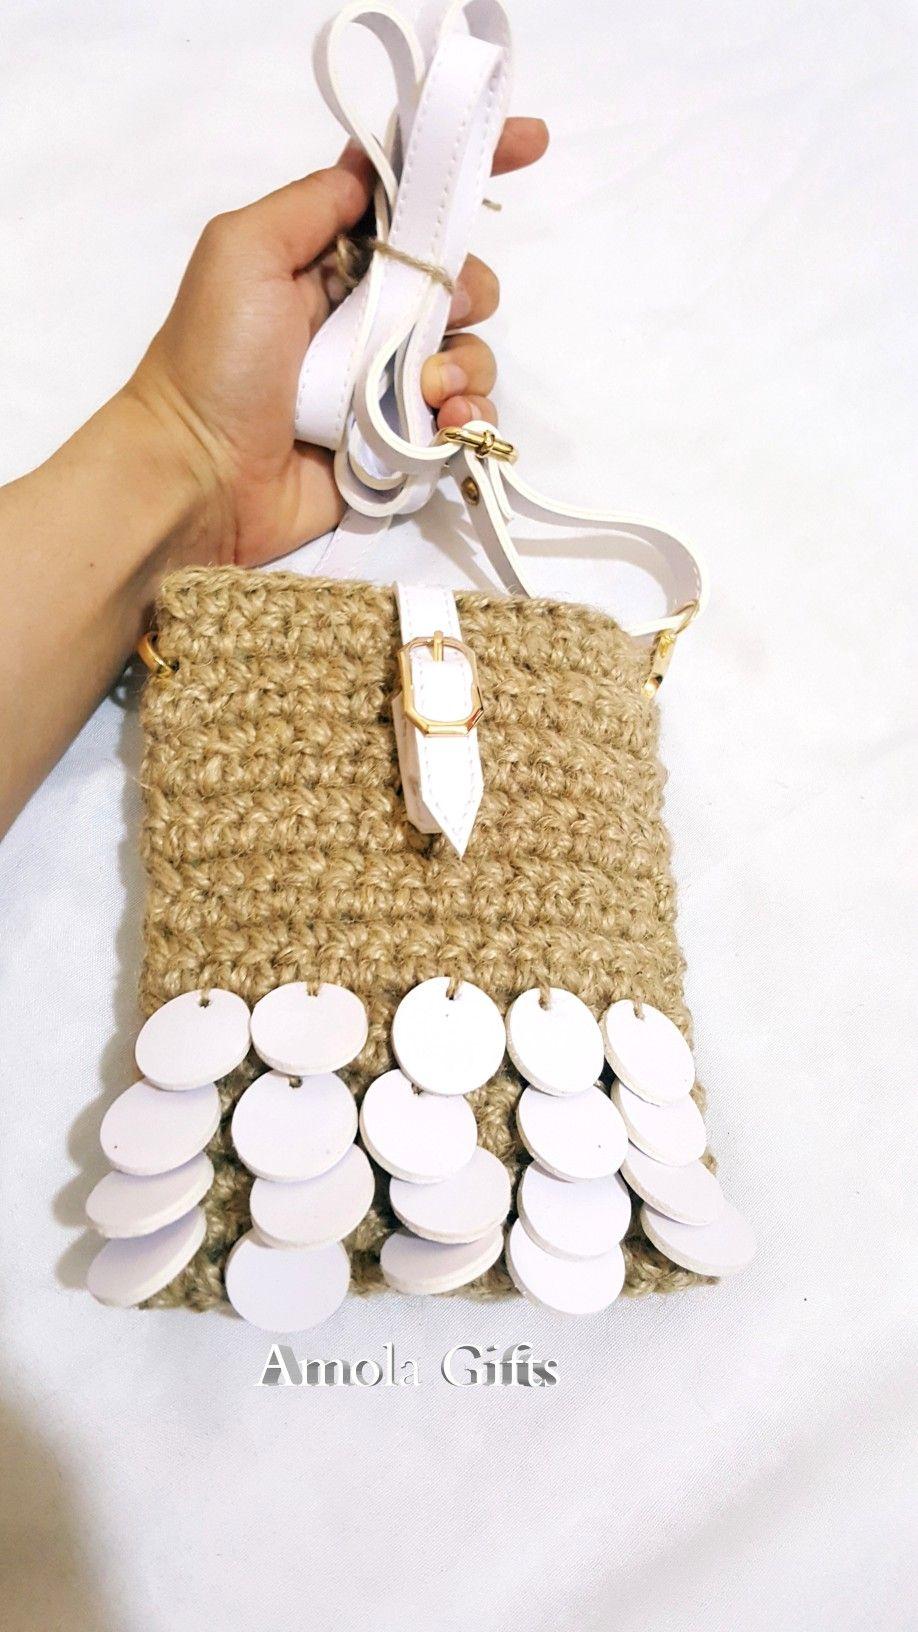 مينى باج خفيفه وسريعه Crochet Straw Bag Bags